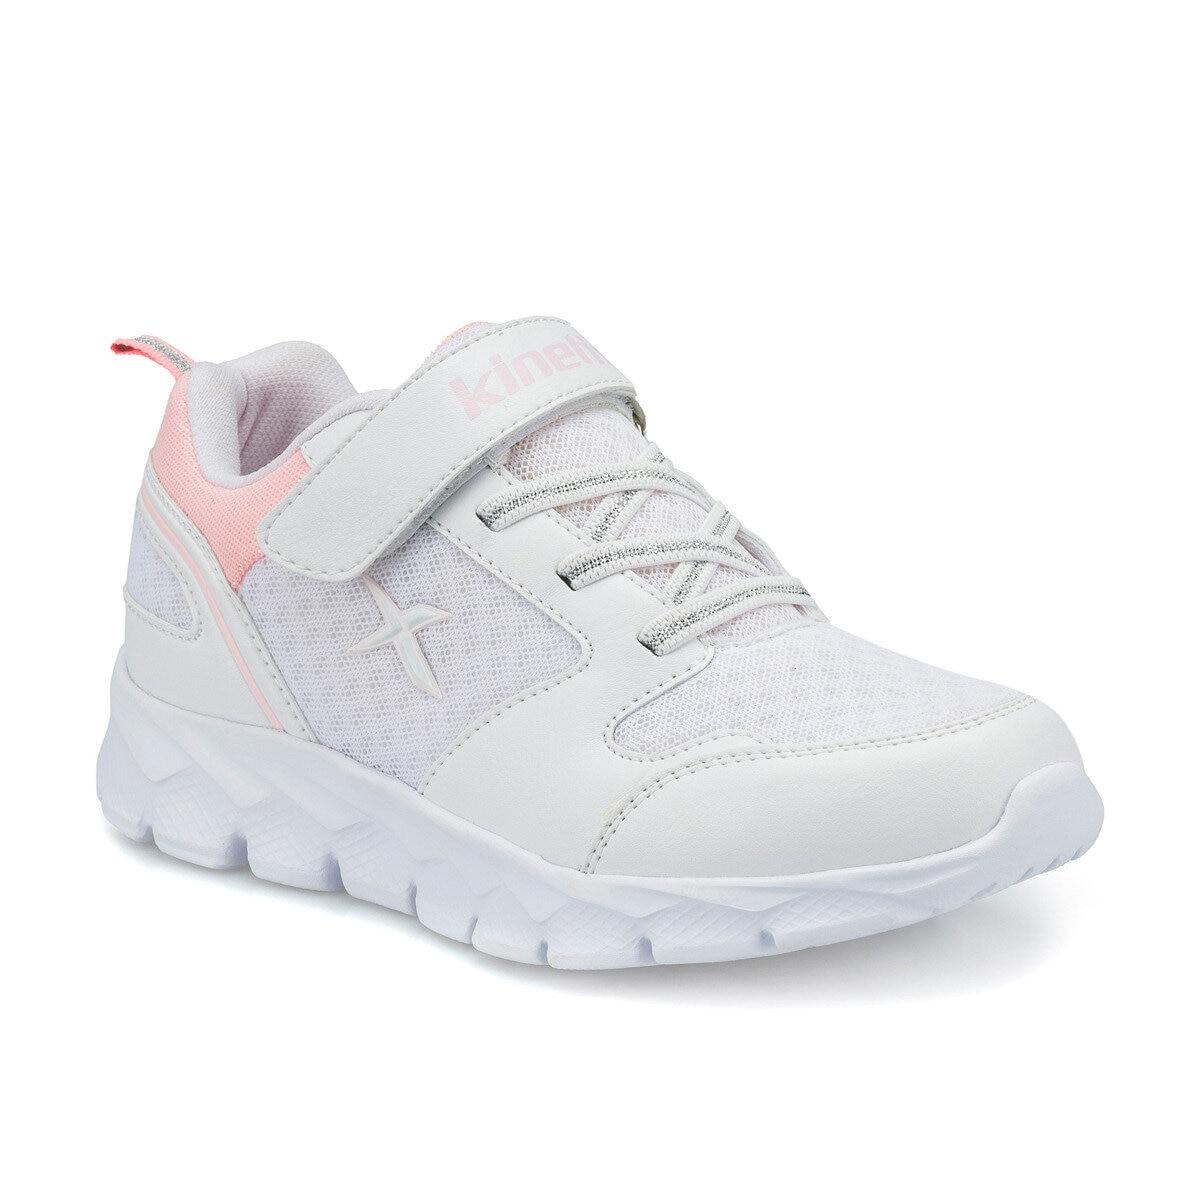 FLO OKA J MESH White Female Child Walking Shoes KINETIX